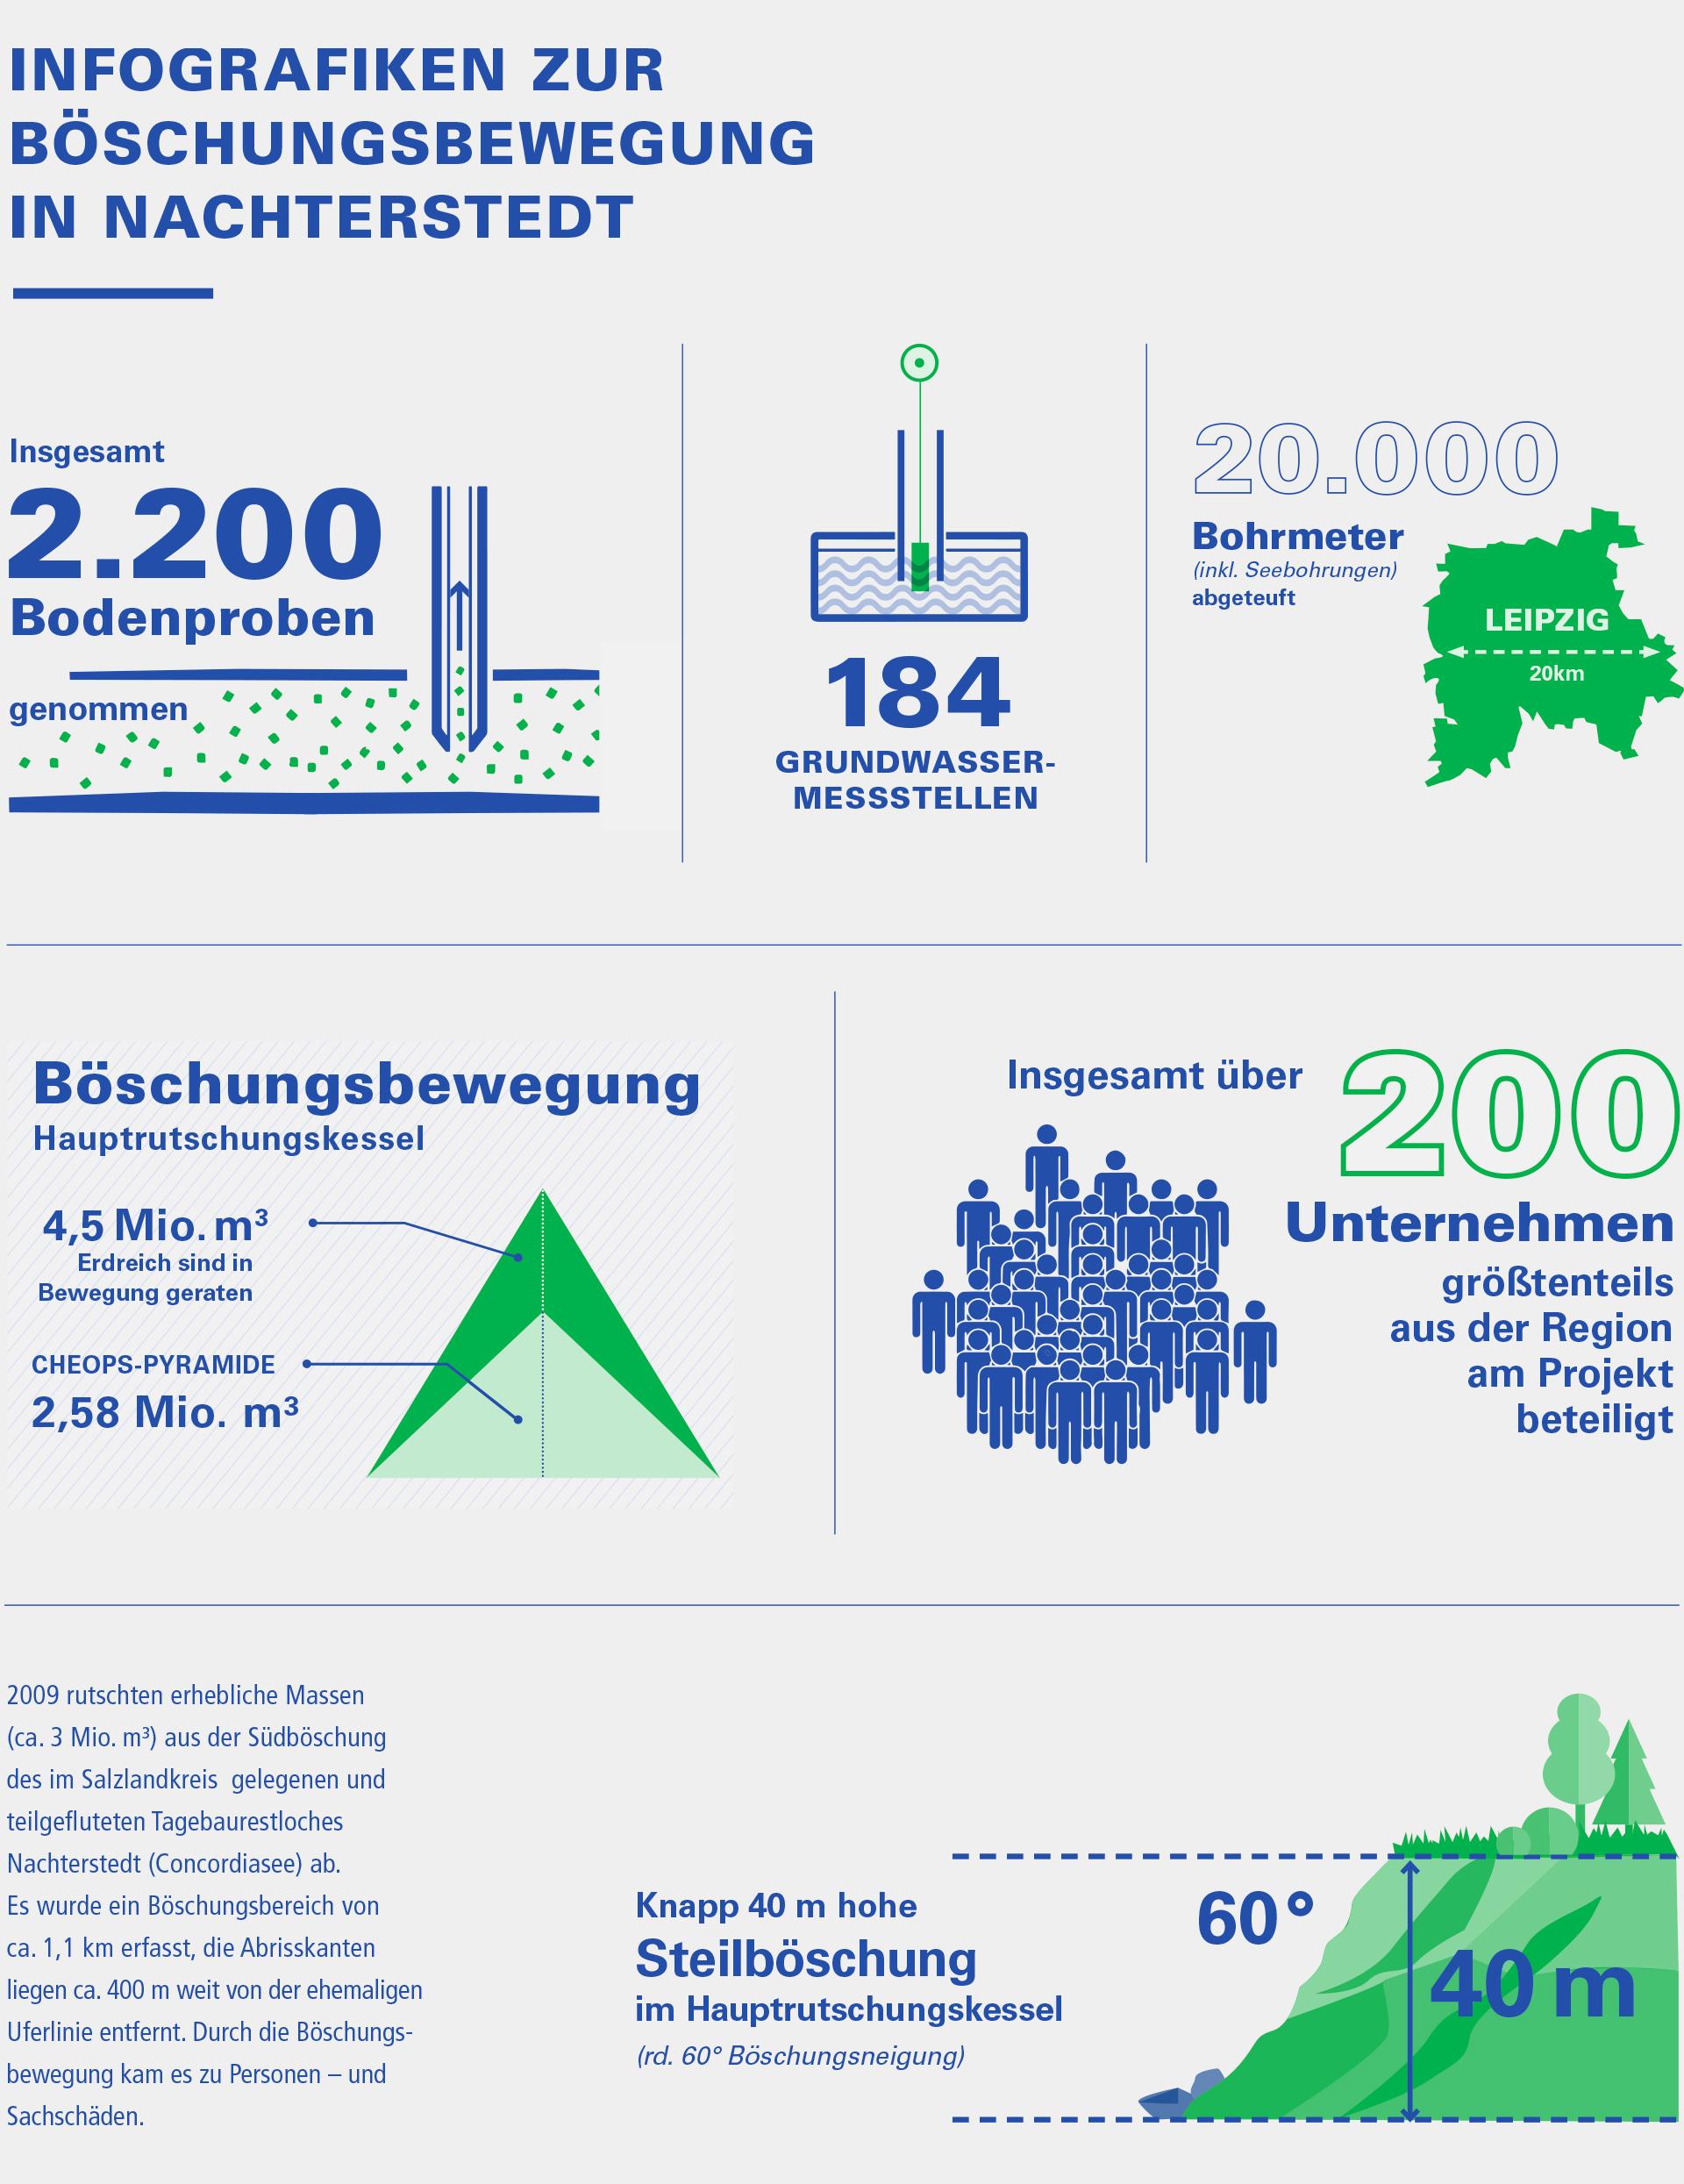 Referenz agreement - Infografik 5